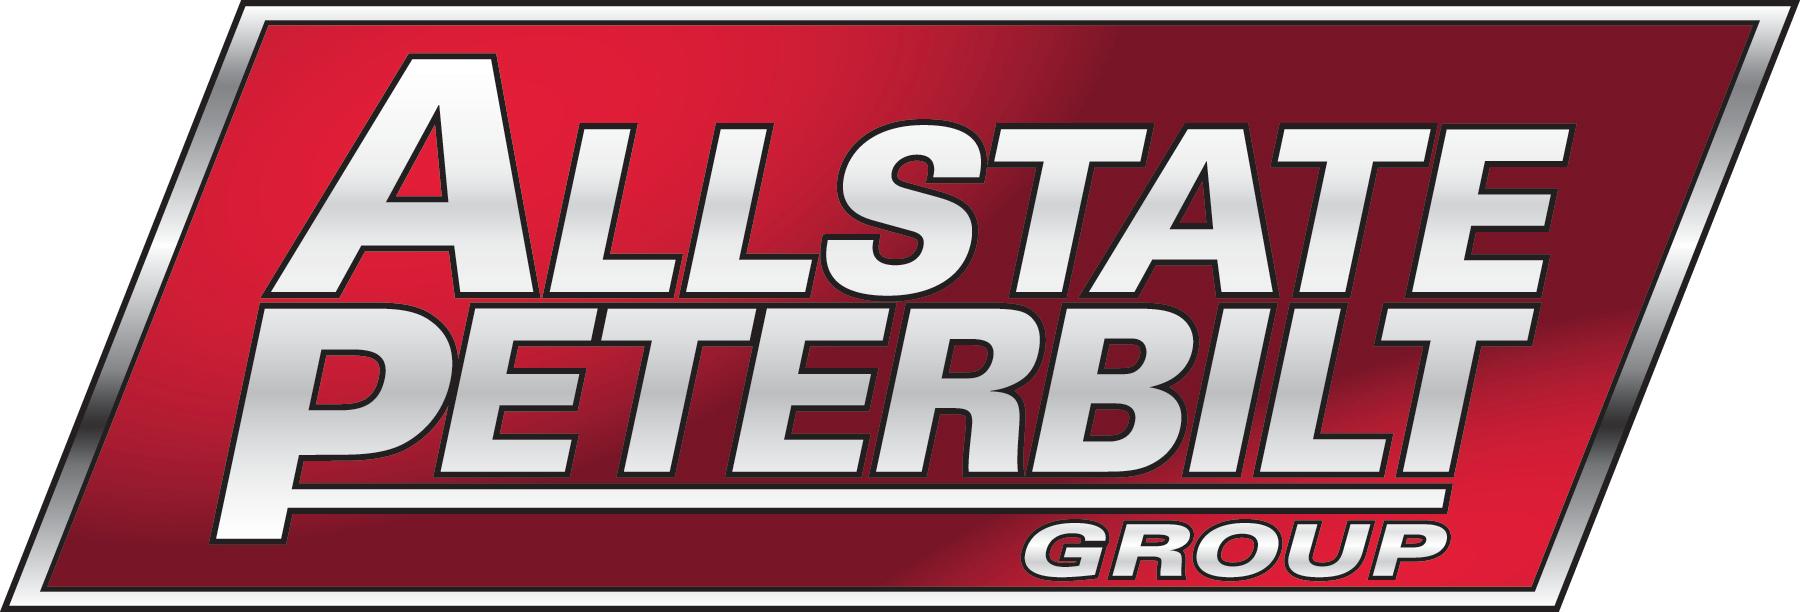 https://growthzonesitesprod.azureedge.net/wp-content/uploads/sites/1720/2020/08/Allstate-Peterbilt-Logo-CMYK-300ppi.png